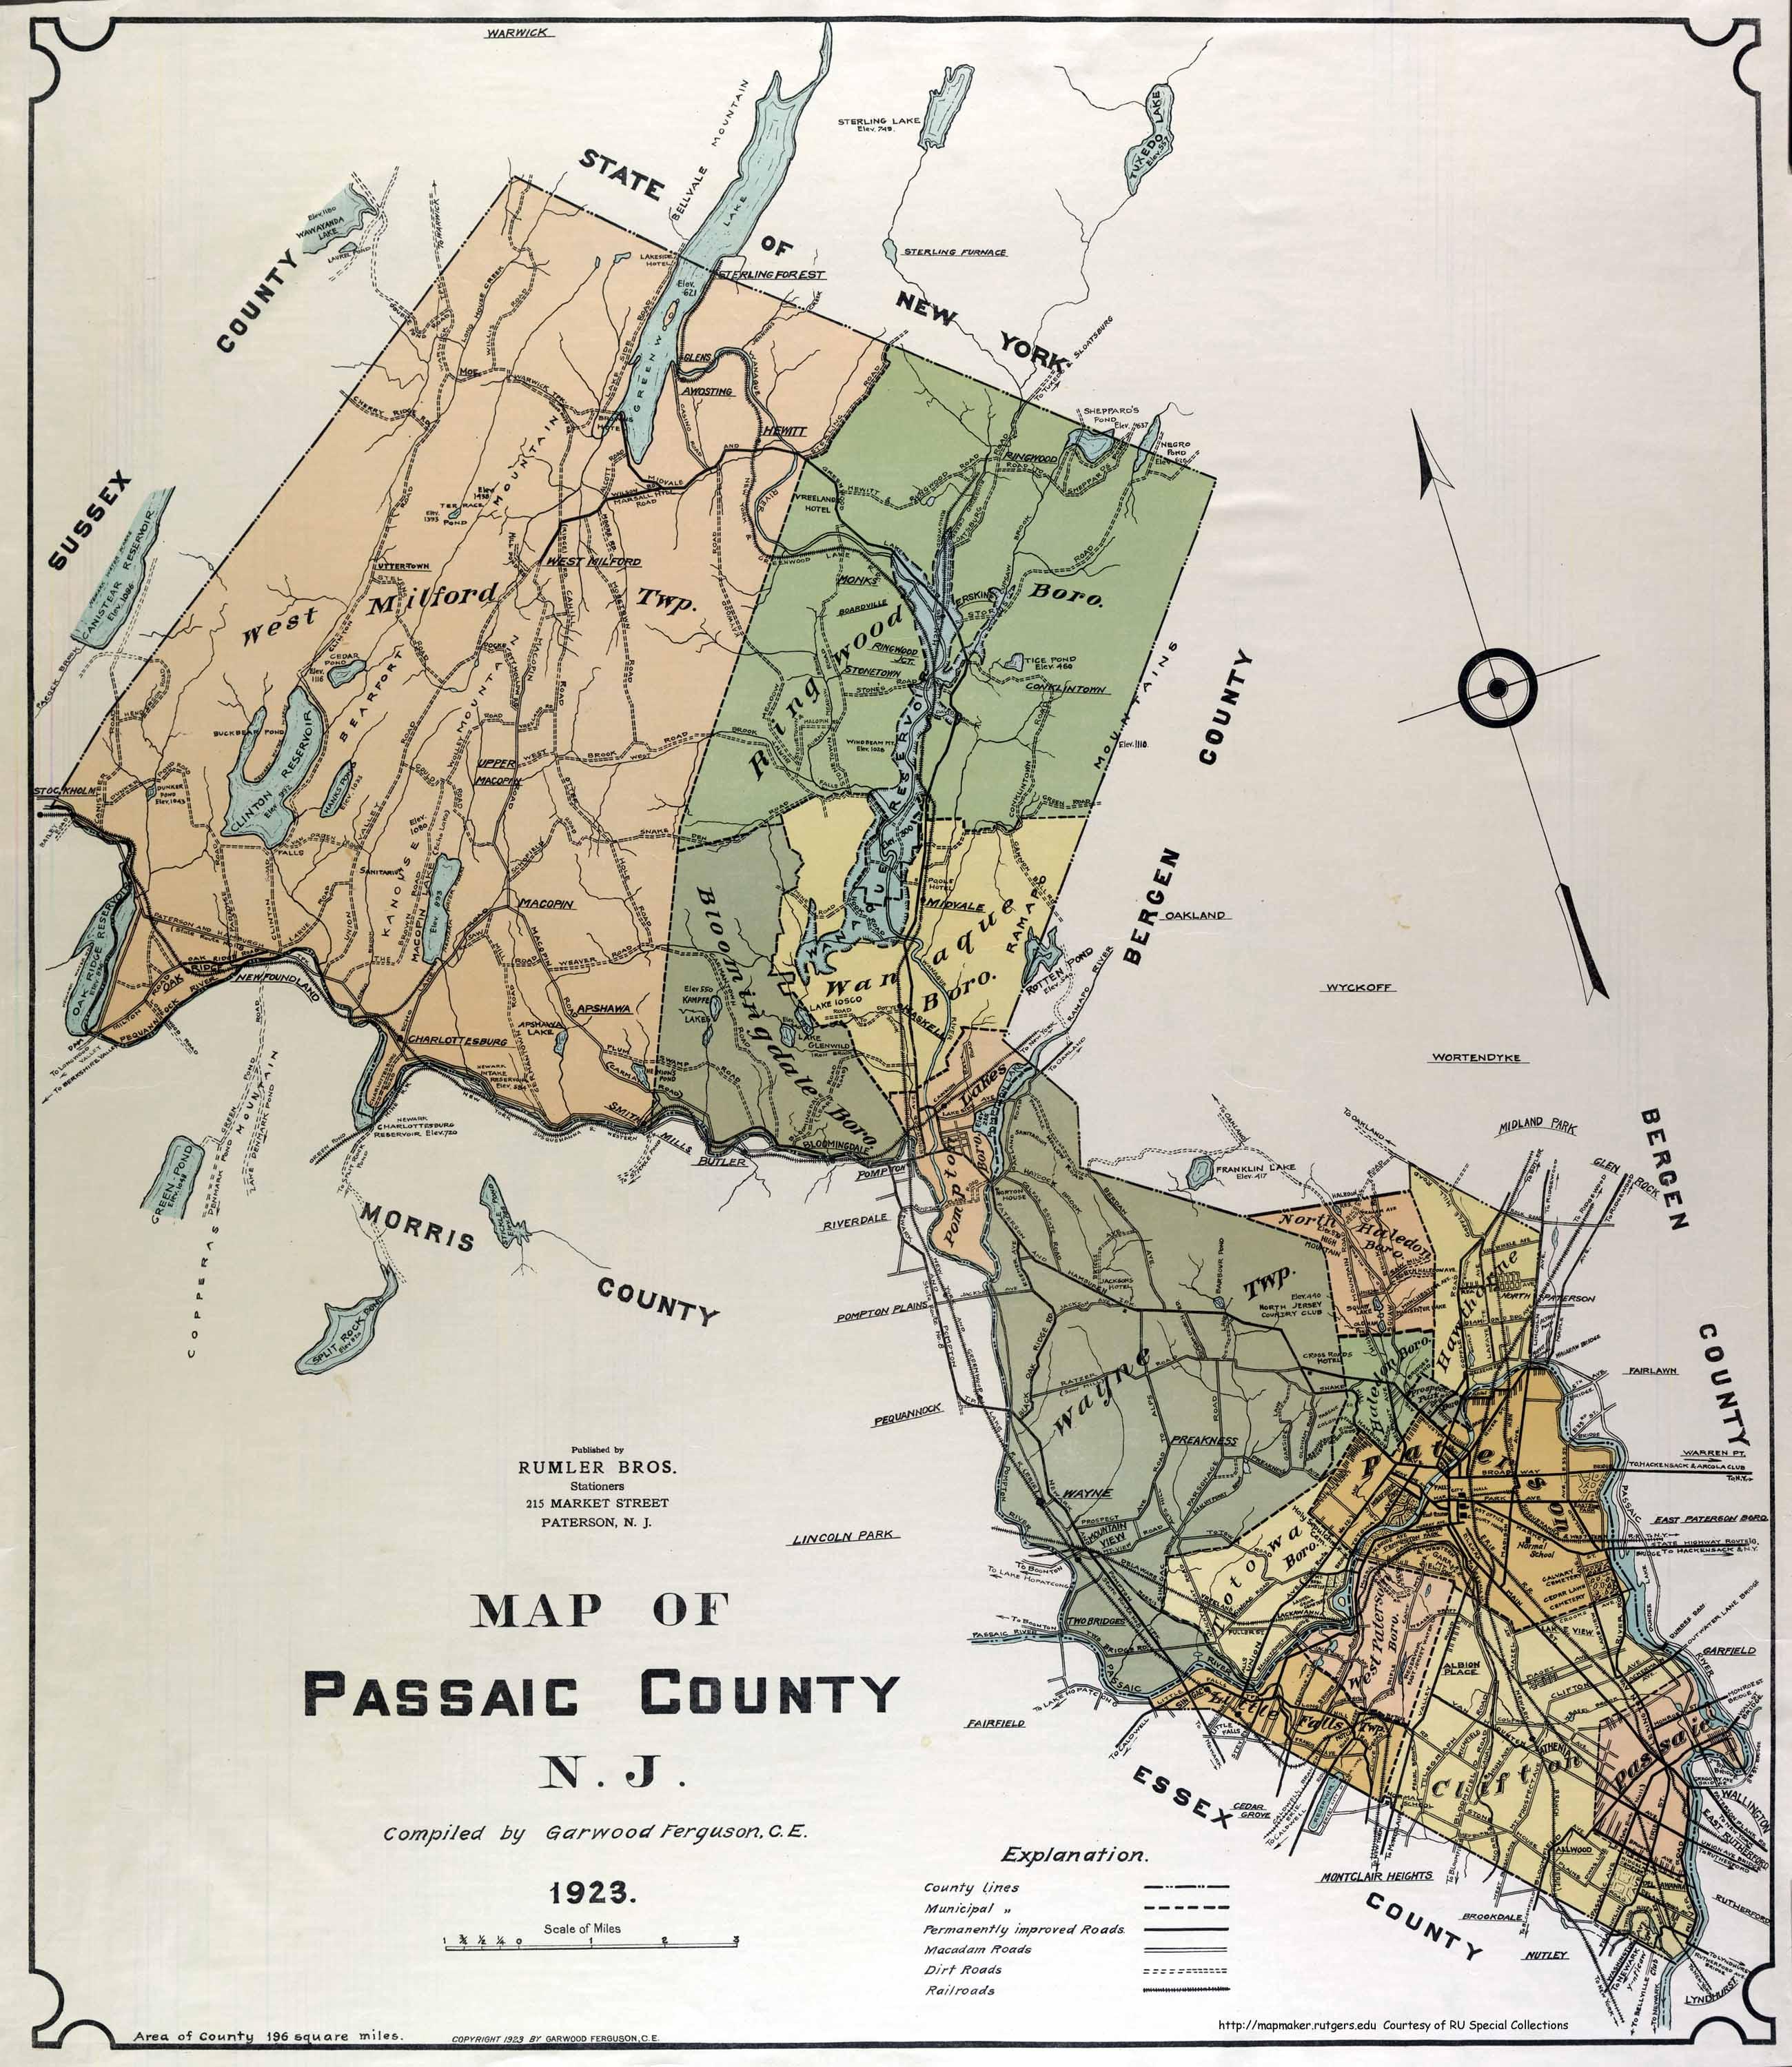 New jersey passaic county wayne - New Jersey Passaic County Wayne 0